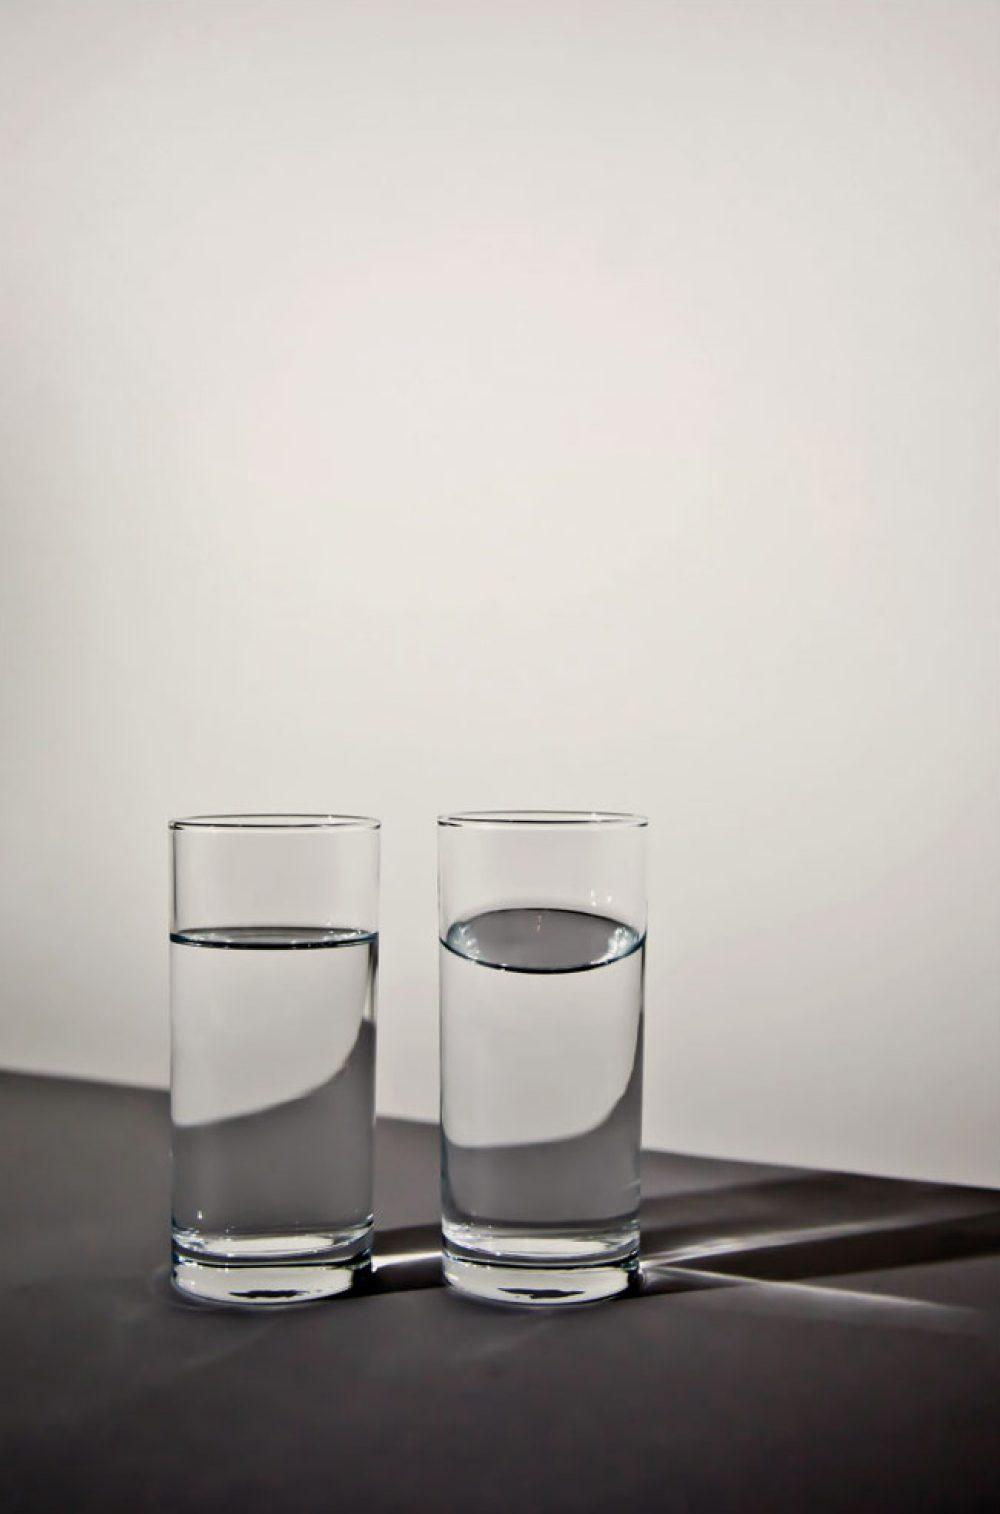 Stilles Wasser II (2015), C-Print, 54 x 36 cm, Ed. 5 + 2 AP